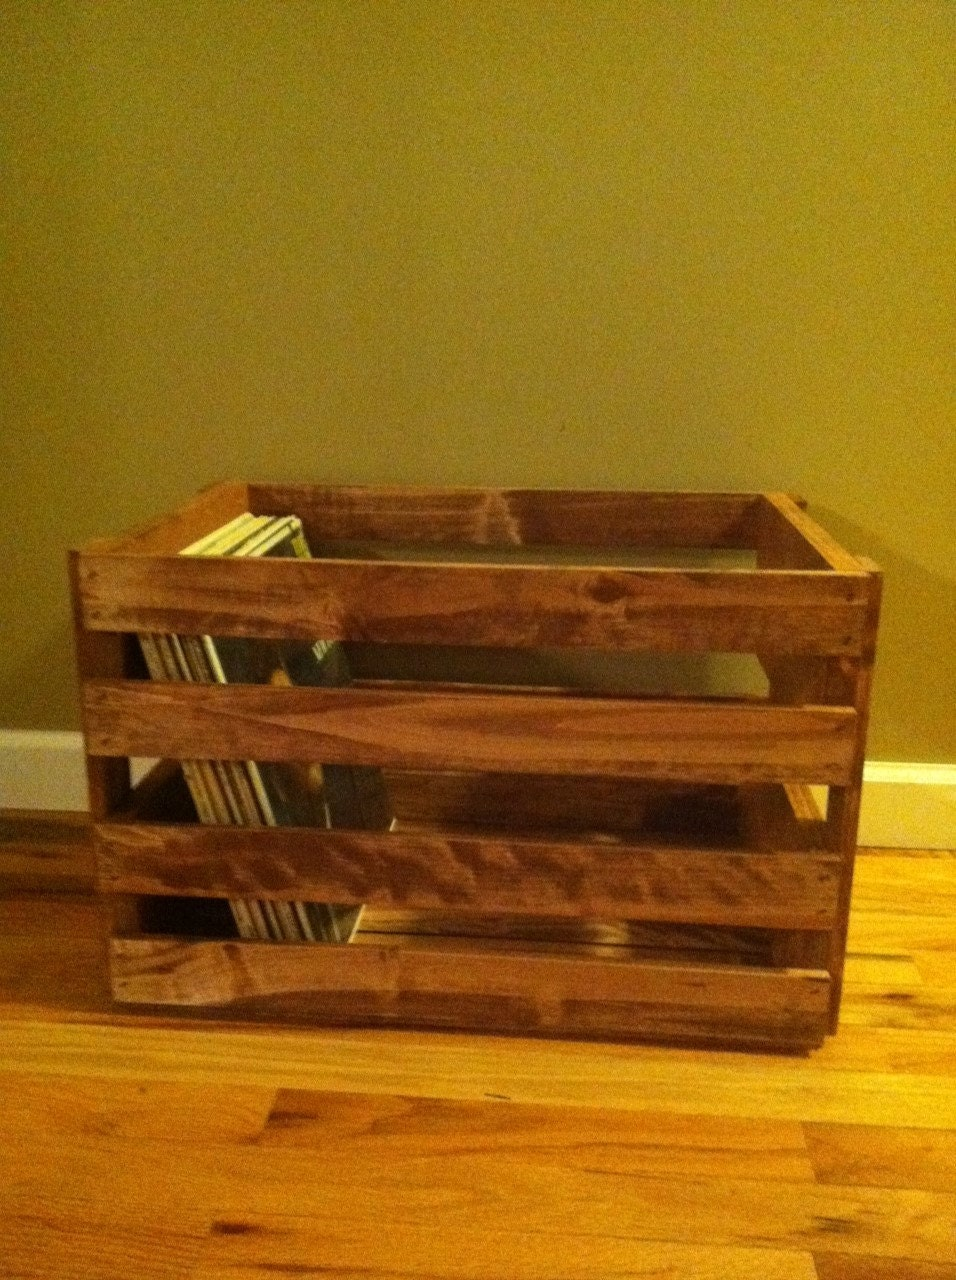 Vinyl Record Holder Wood Crate By Darlastudio66 On Etsy